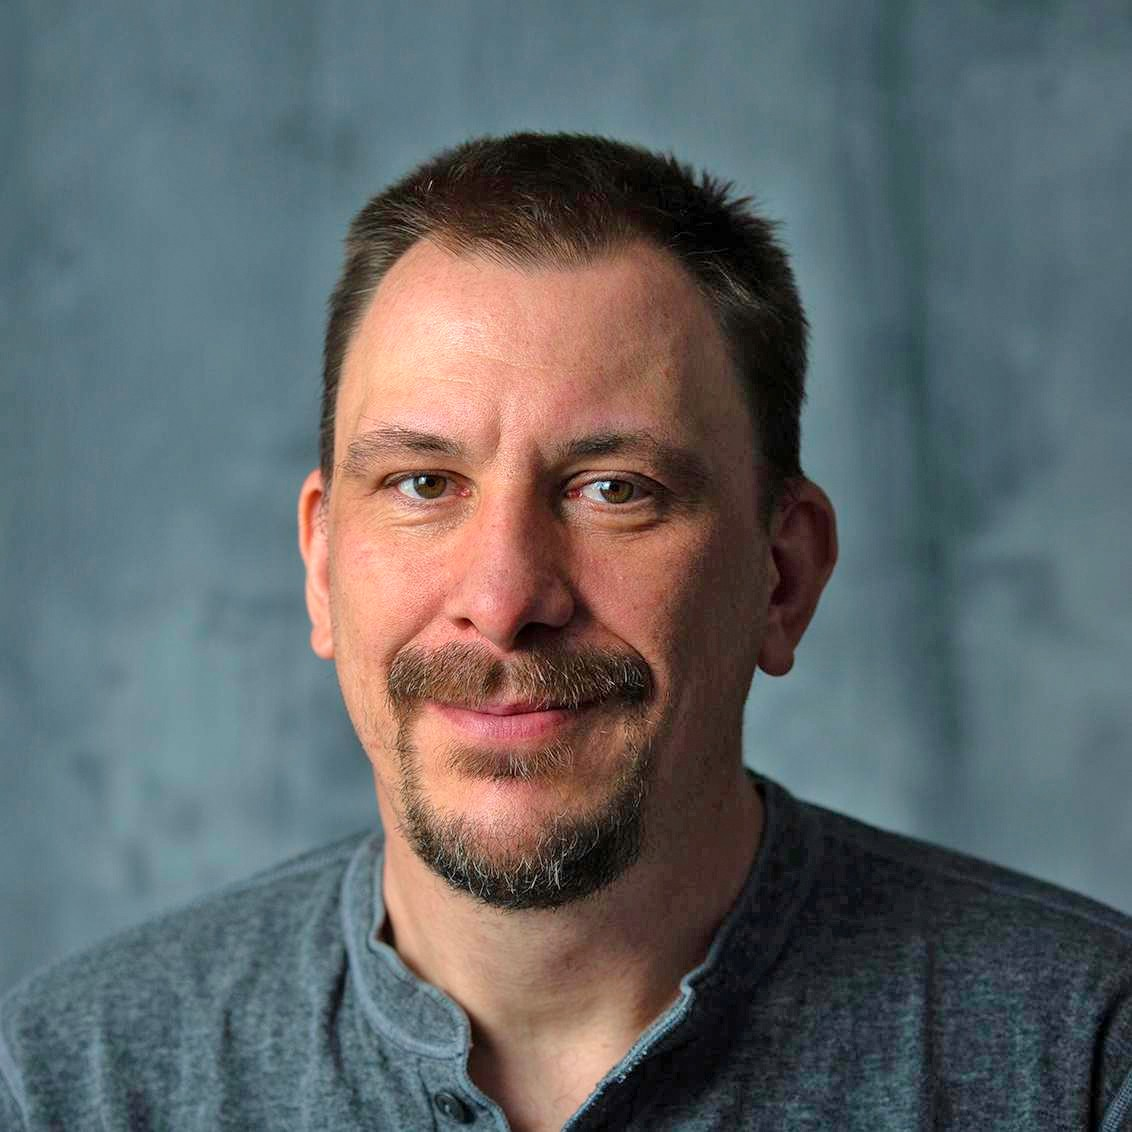 Penn State Associate Professor of Landscape Architecture Peter Stempel